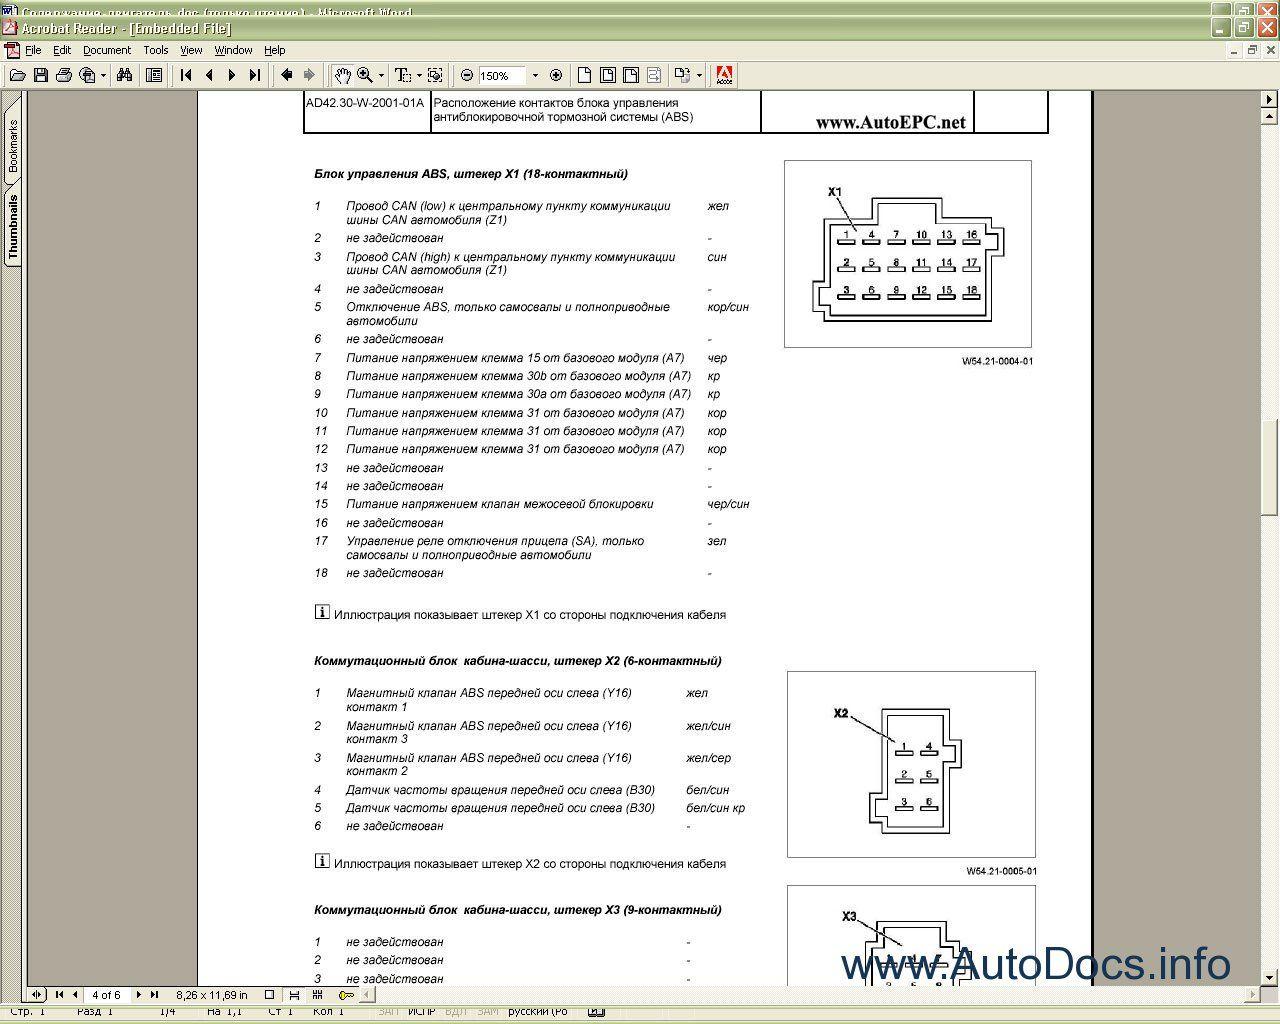 Mercedes benz actros maintenance manual 2 manuals pinterest mercedes benz actros maintenance manual 2 fandeluxe Choice Image